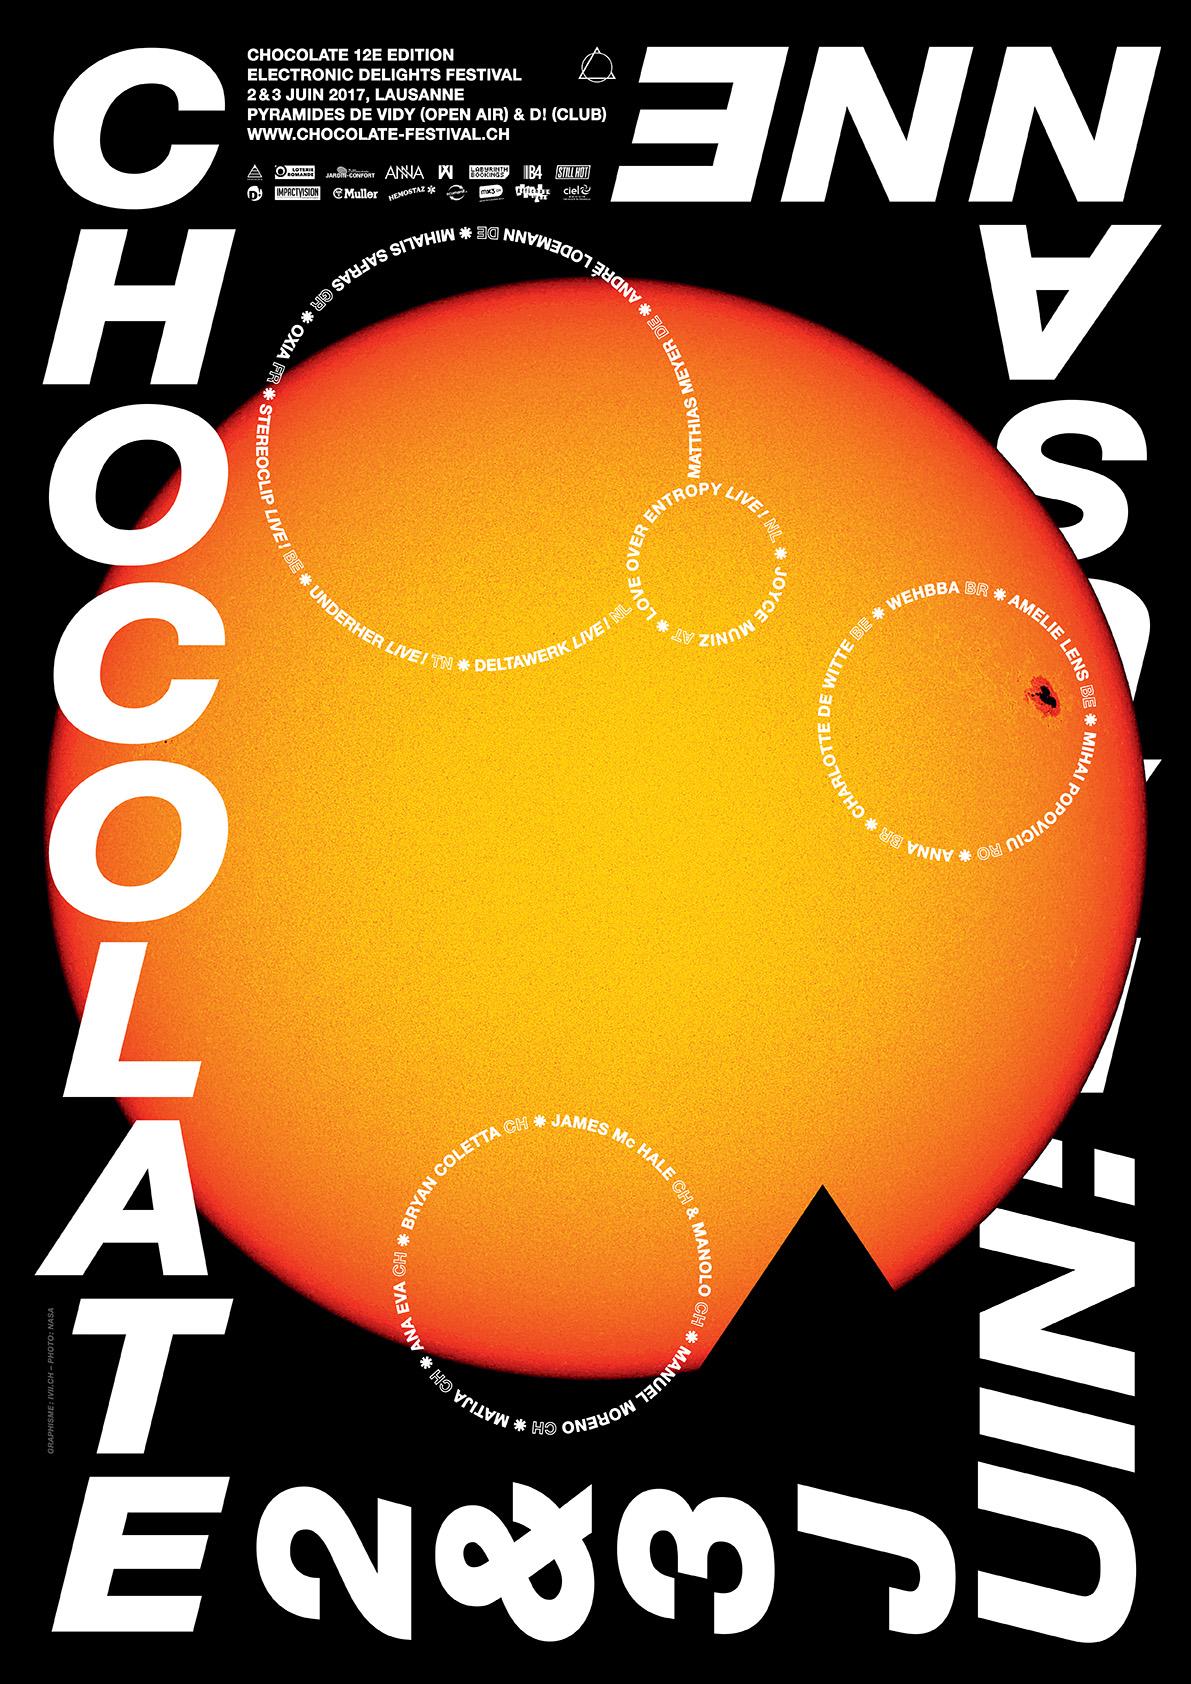 Chocolate 2017 - 2-3 juinOxia (FR), Wehbba (BR), Charlotte de Witte (BE), ANNA (BR) - Mihalis Safras (GR), Matthias Meyer (DE), Amelie Lens (BE), André Lodemann (DE), UNDERHER - Live! (TN), Stereoclip - Live! (BE), Mihai Popoviciu (RO), Deltawerk - Live (NL), Joyce Muniz (AT), Love Over Entropy - Live! (NL), Manuel Moreno (CH), Matija (CH), James Mc Hale (CH), Manolo (CH), Bryan Coletta (CH), Ana Eva (CH).After-party : D! ClubAffluence : 4'500 personnes— Photo